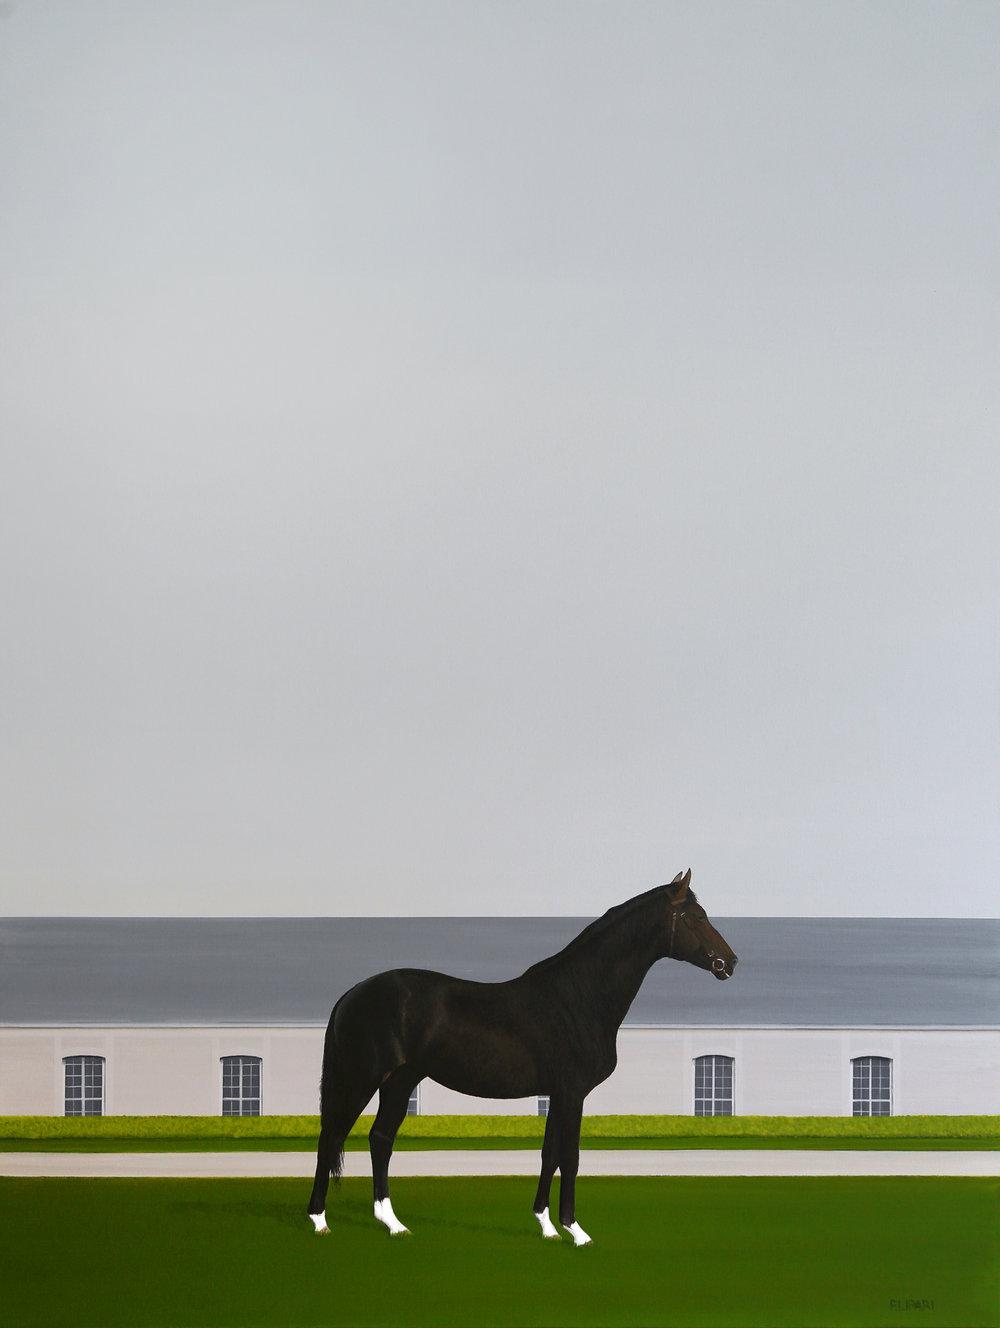 Racing Black, 48x36